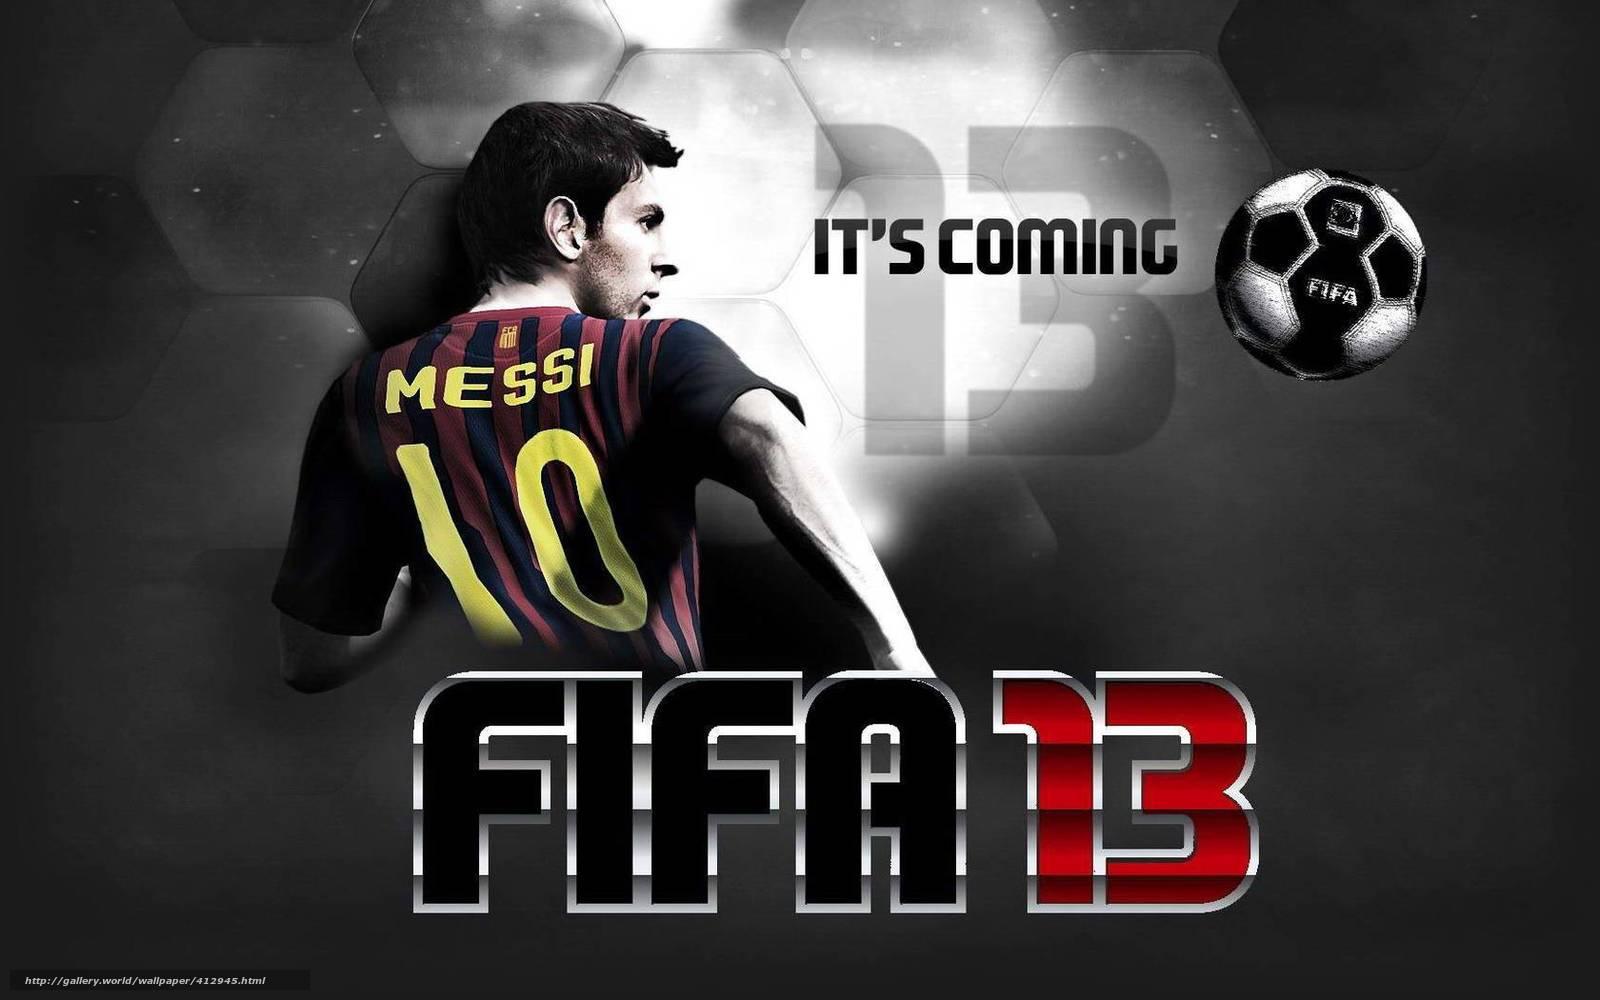 Игра FIFA 16 выход онлайн  fifagameonlineru